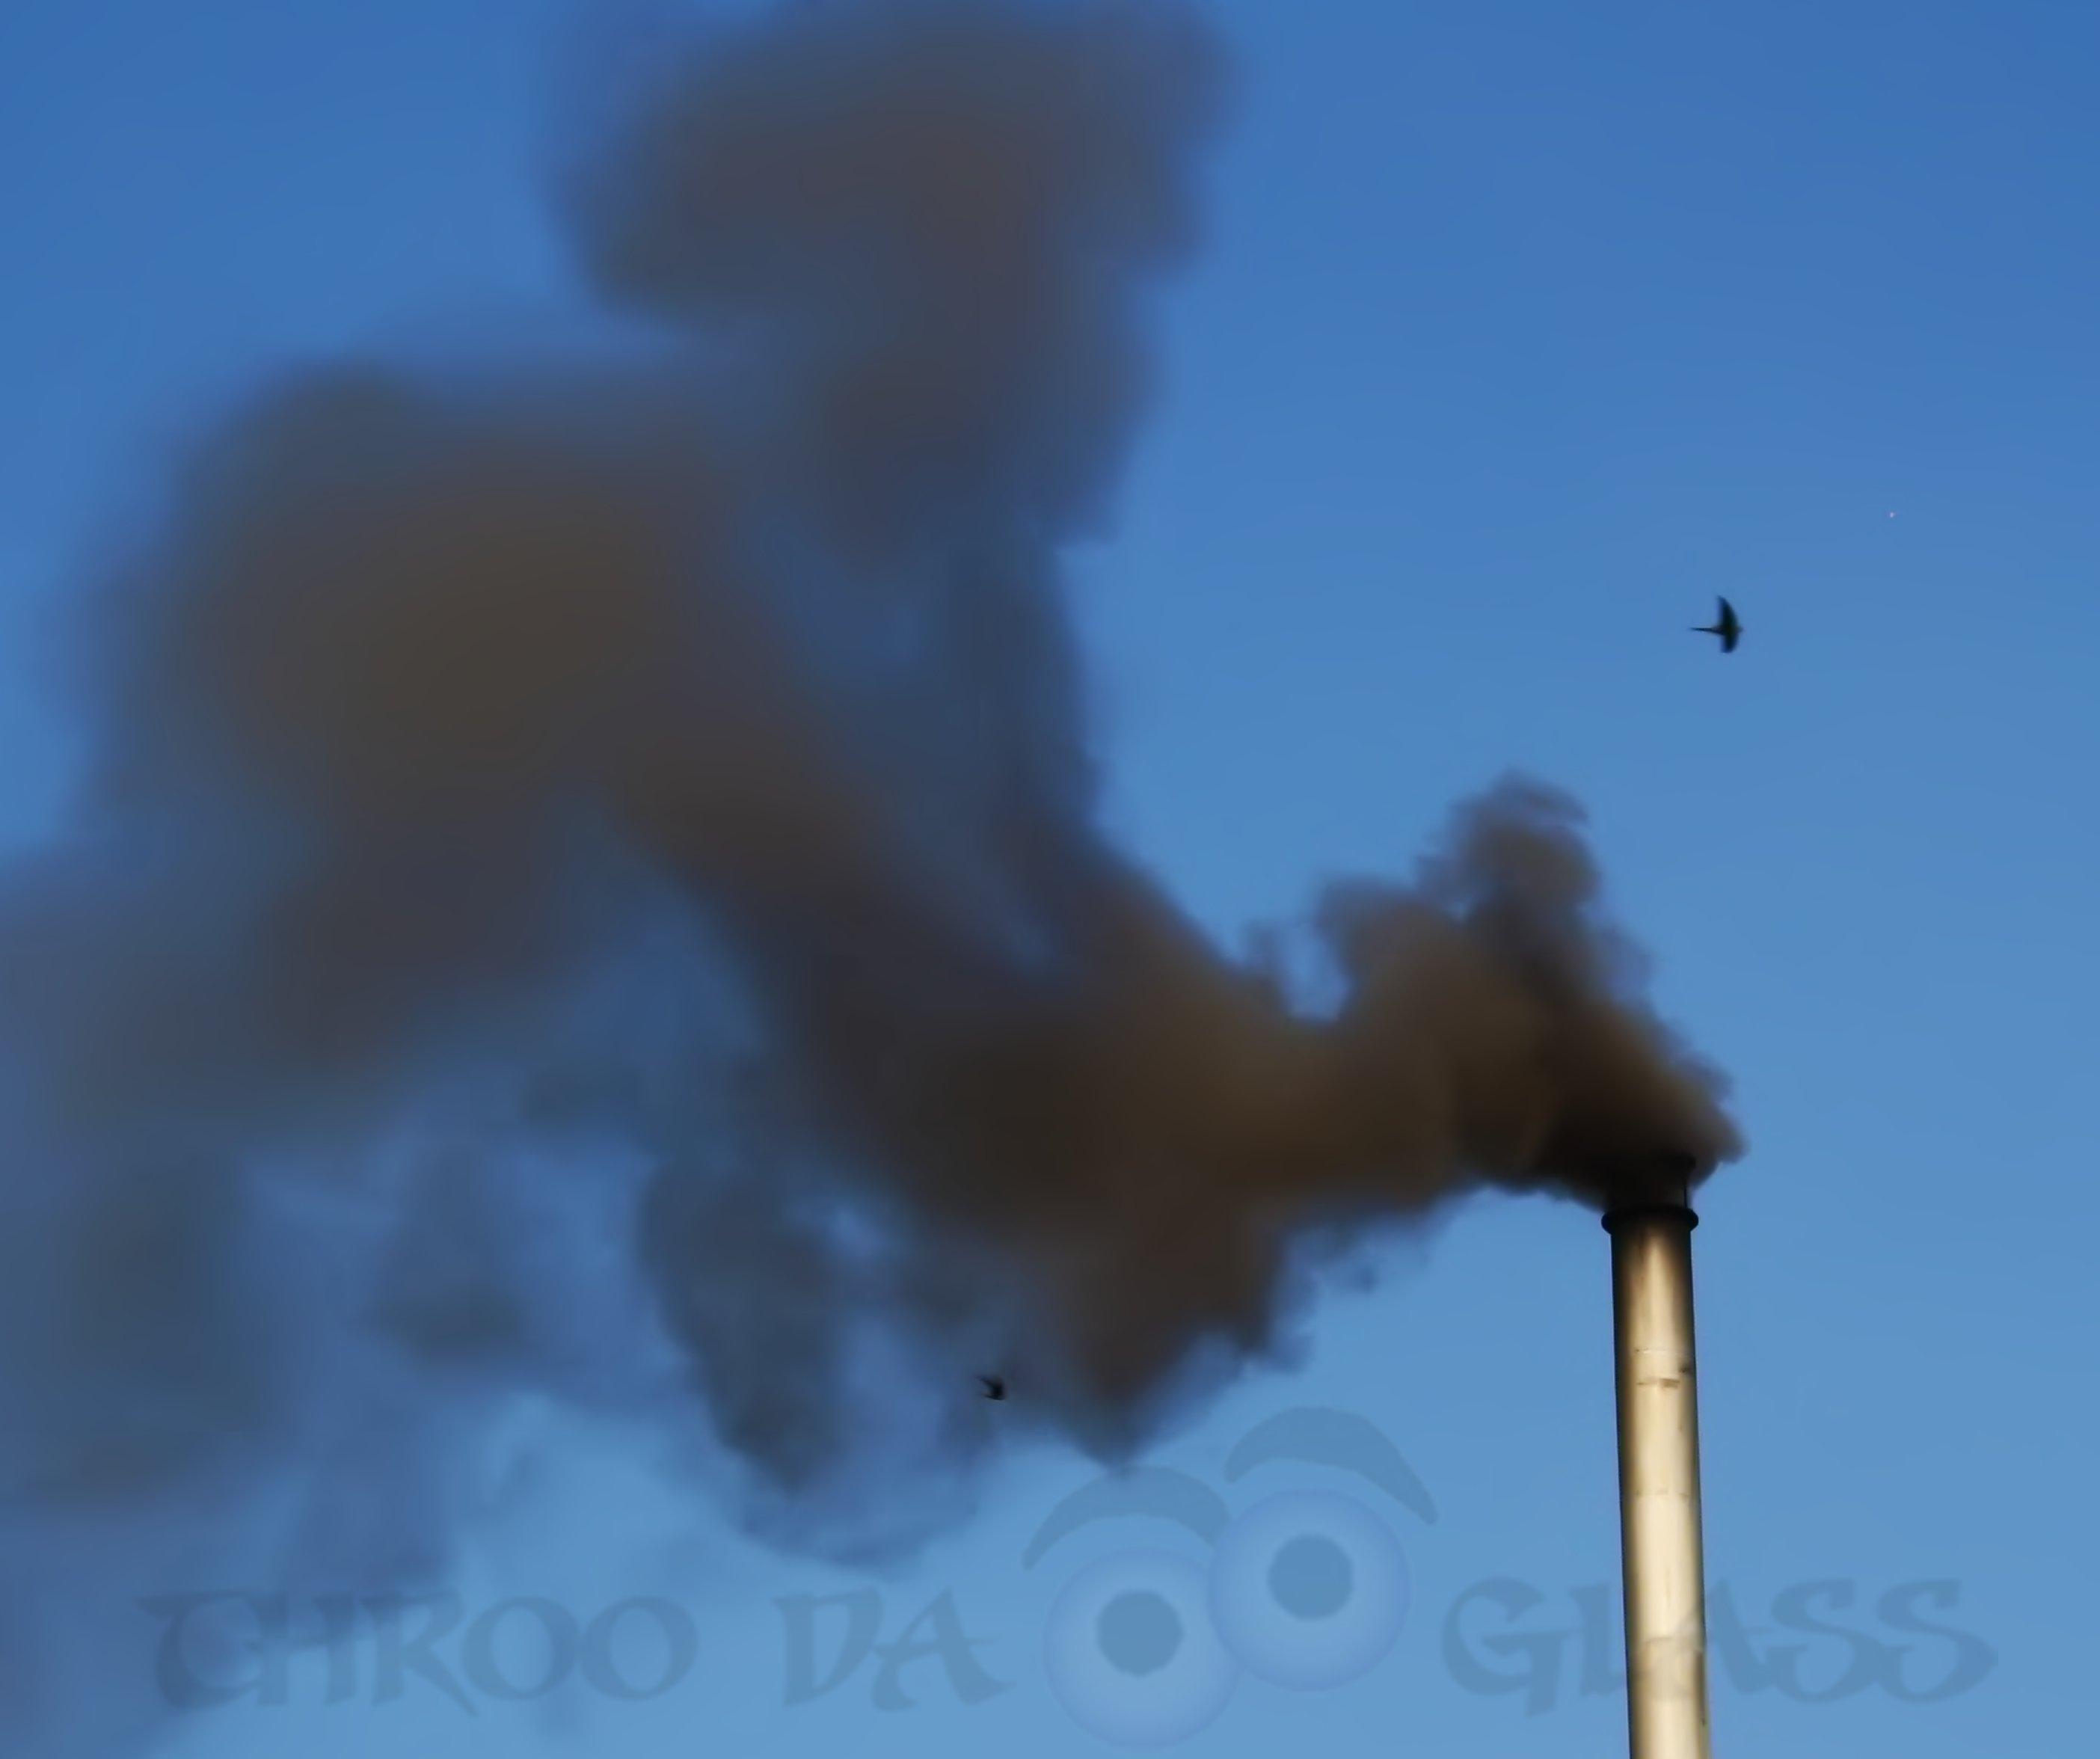 S,stop,pollution,industries,nature,kill,destroy,phenomenon,pm,pravs,pravin,bangalore blog,a-z challenge,karnataka